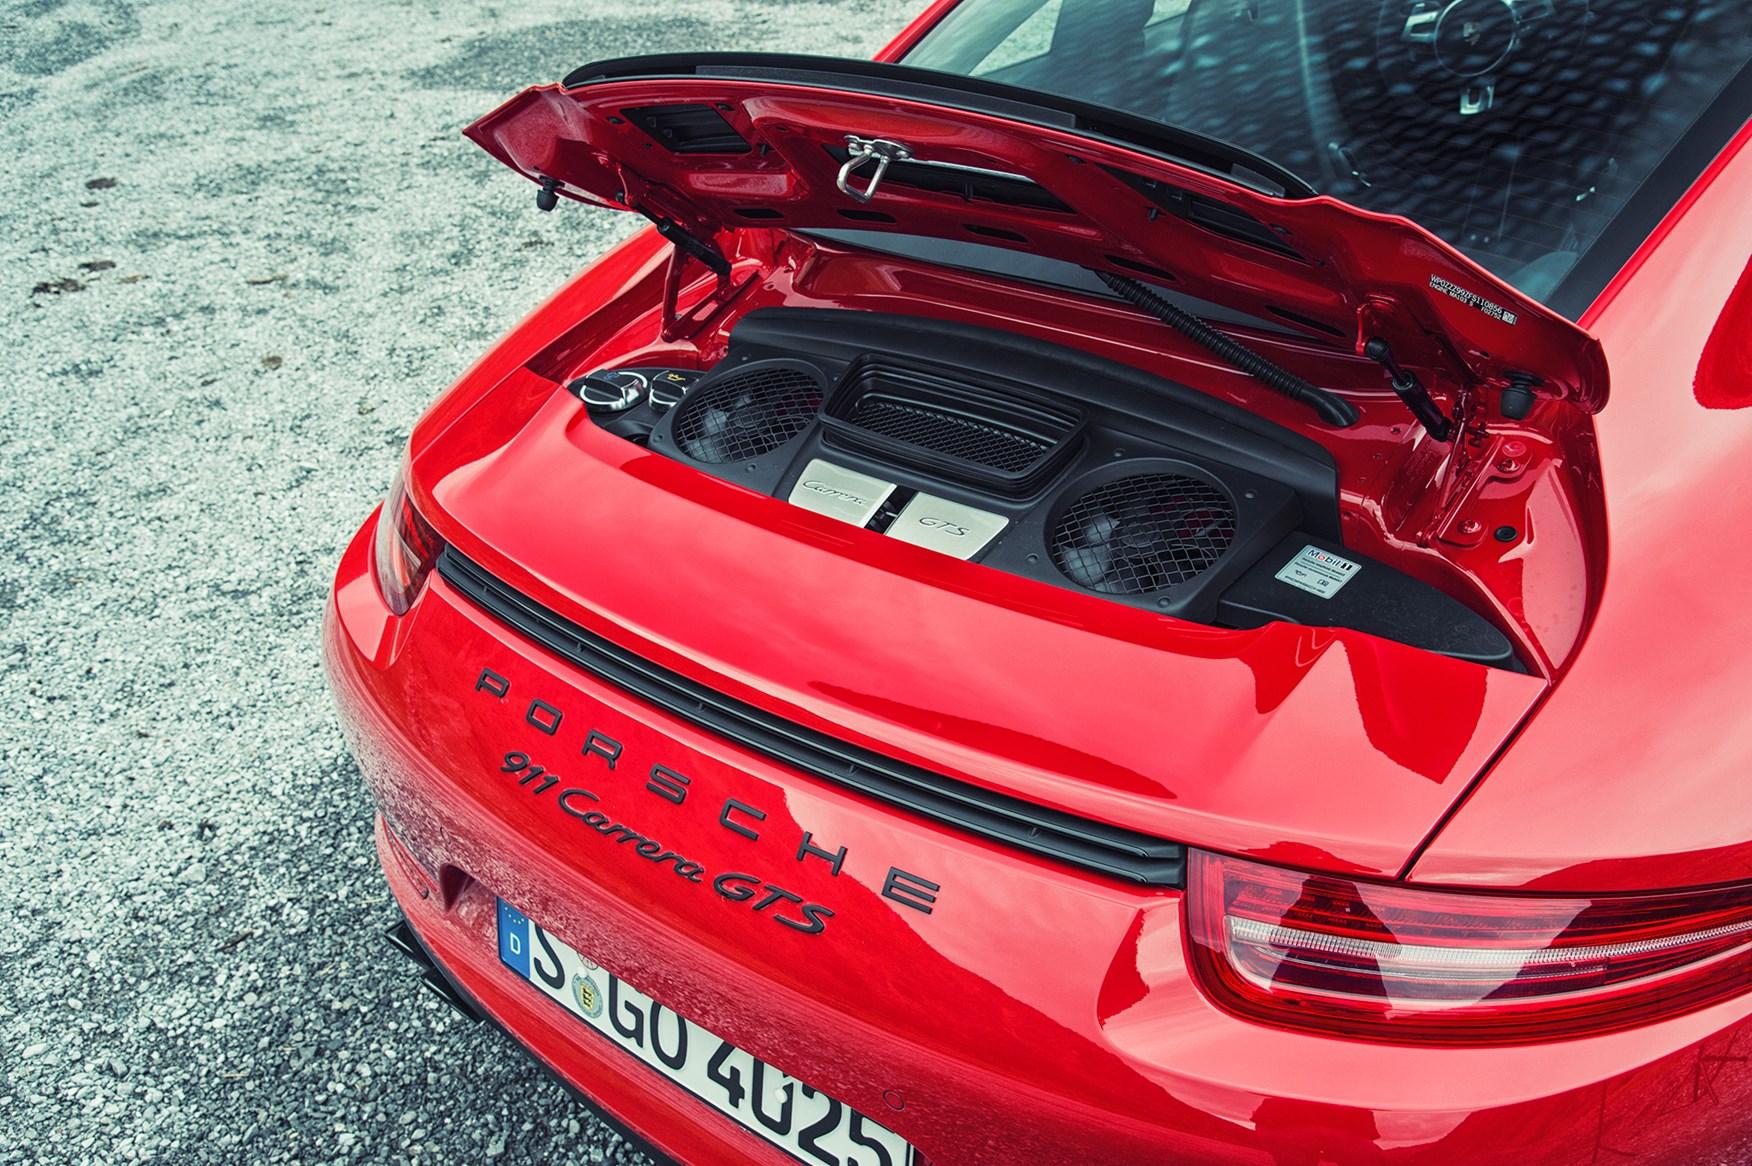 Mercedes Amg Gts Vs Porsche 911 Gts 2015 Review Car Magazine